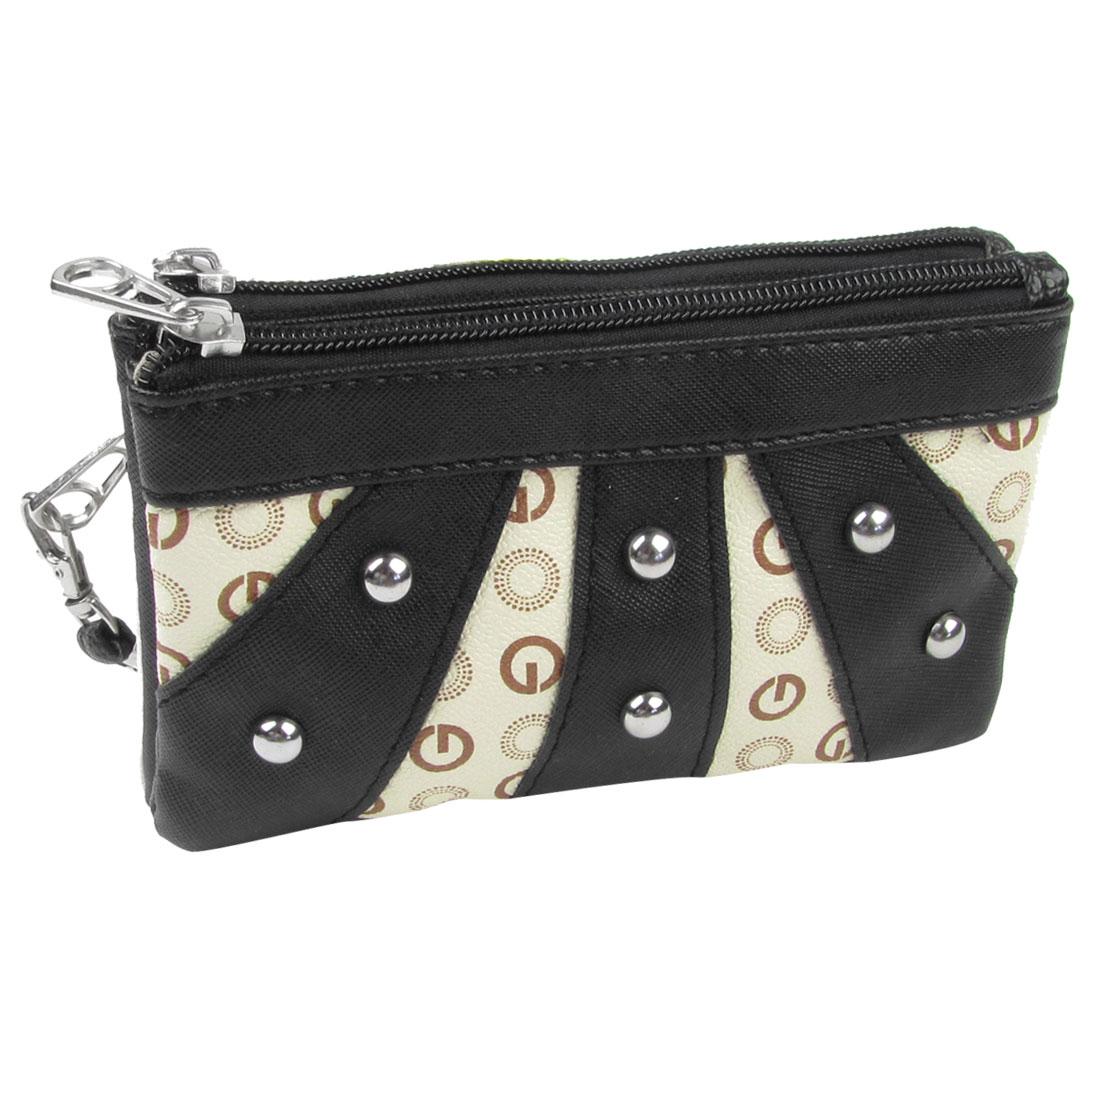 Woman Stud Decor Faux Leather Zipper Closure Wallet Purse Holder Black Ivory